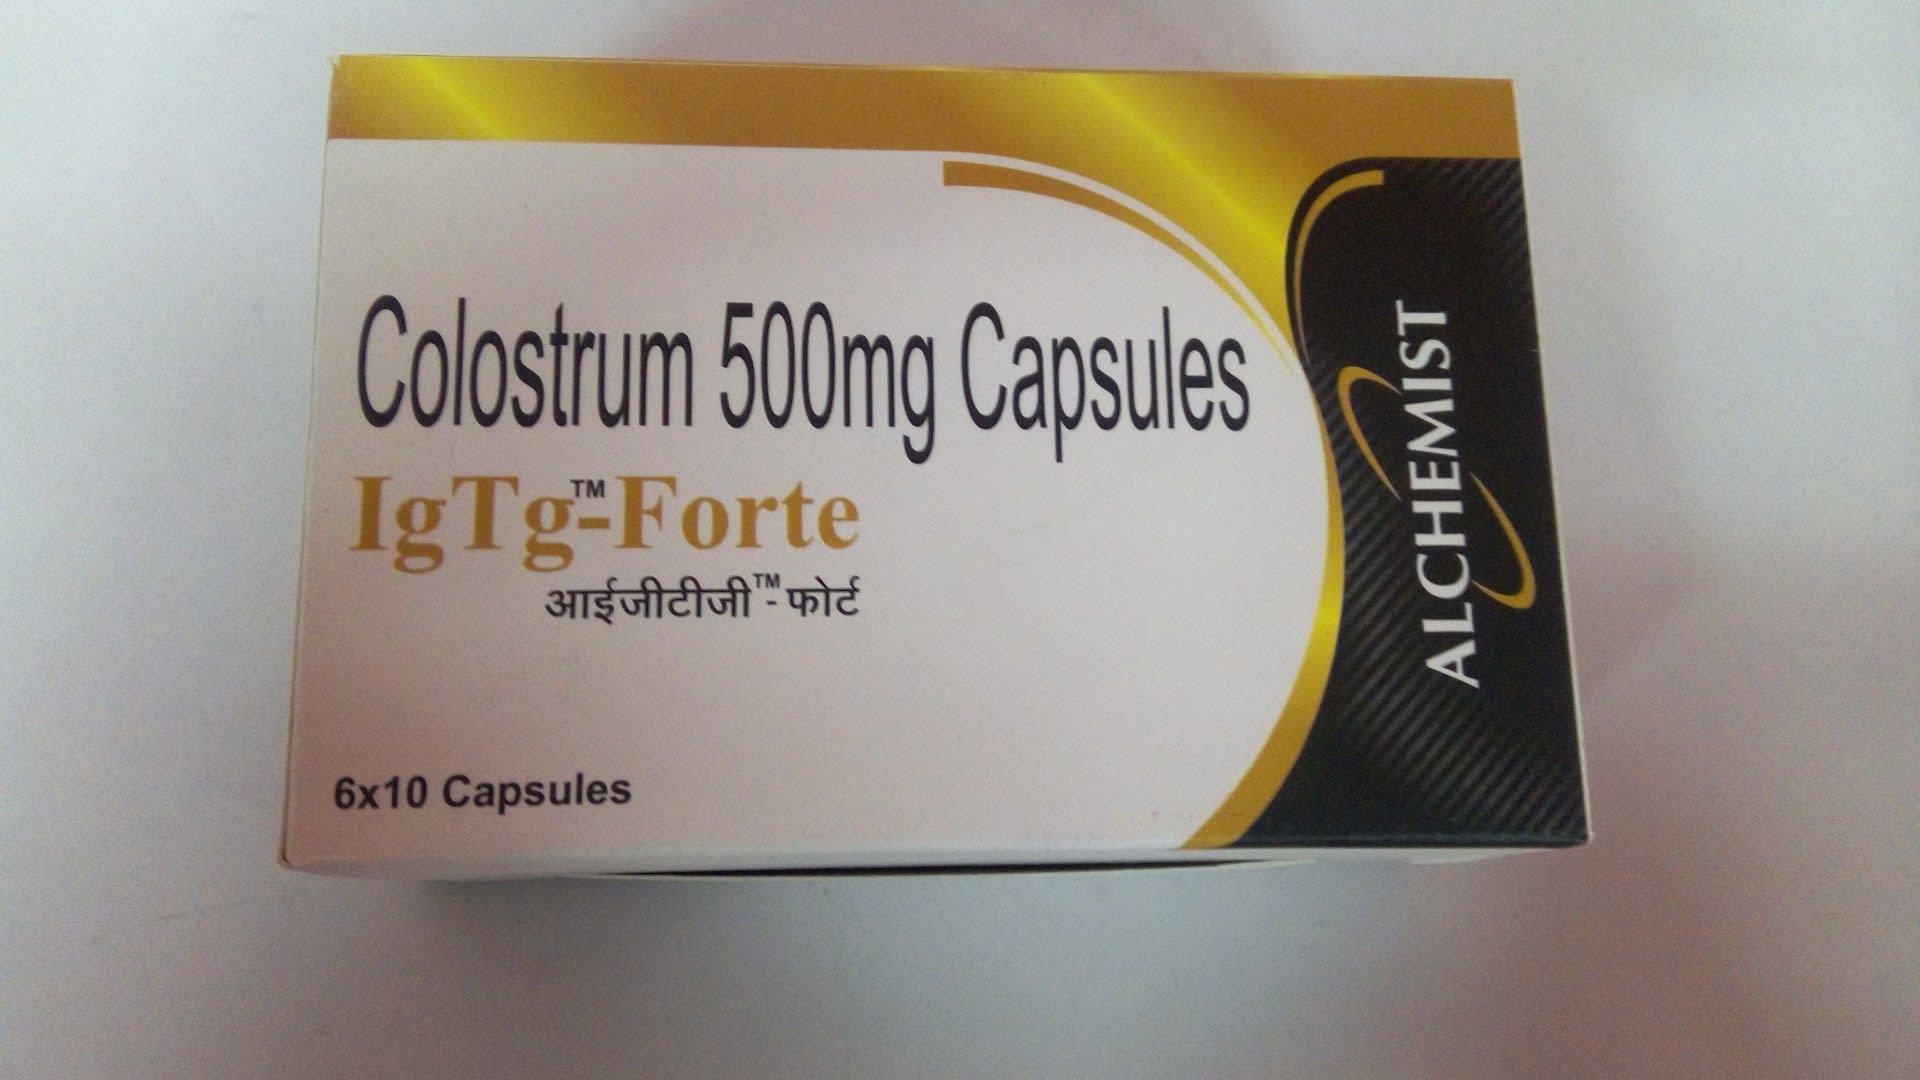 IG TG-Forte Capsule